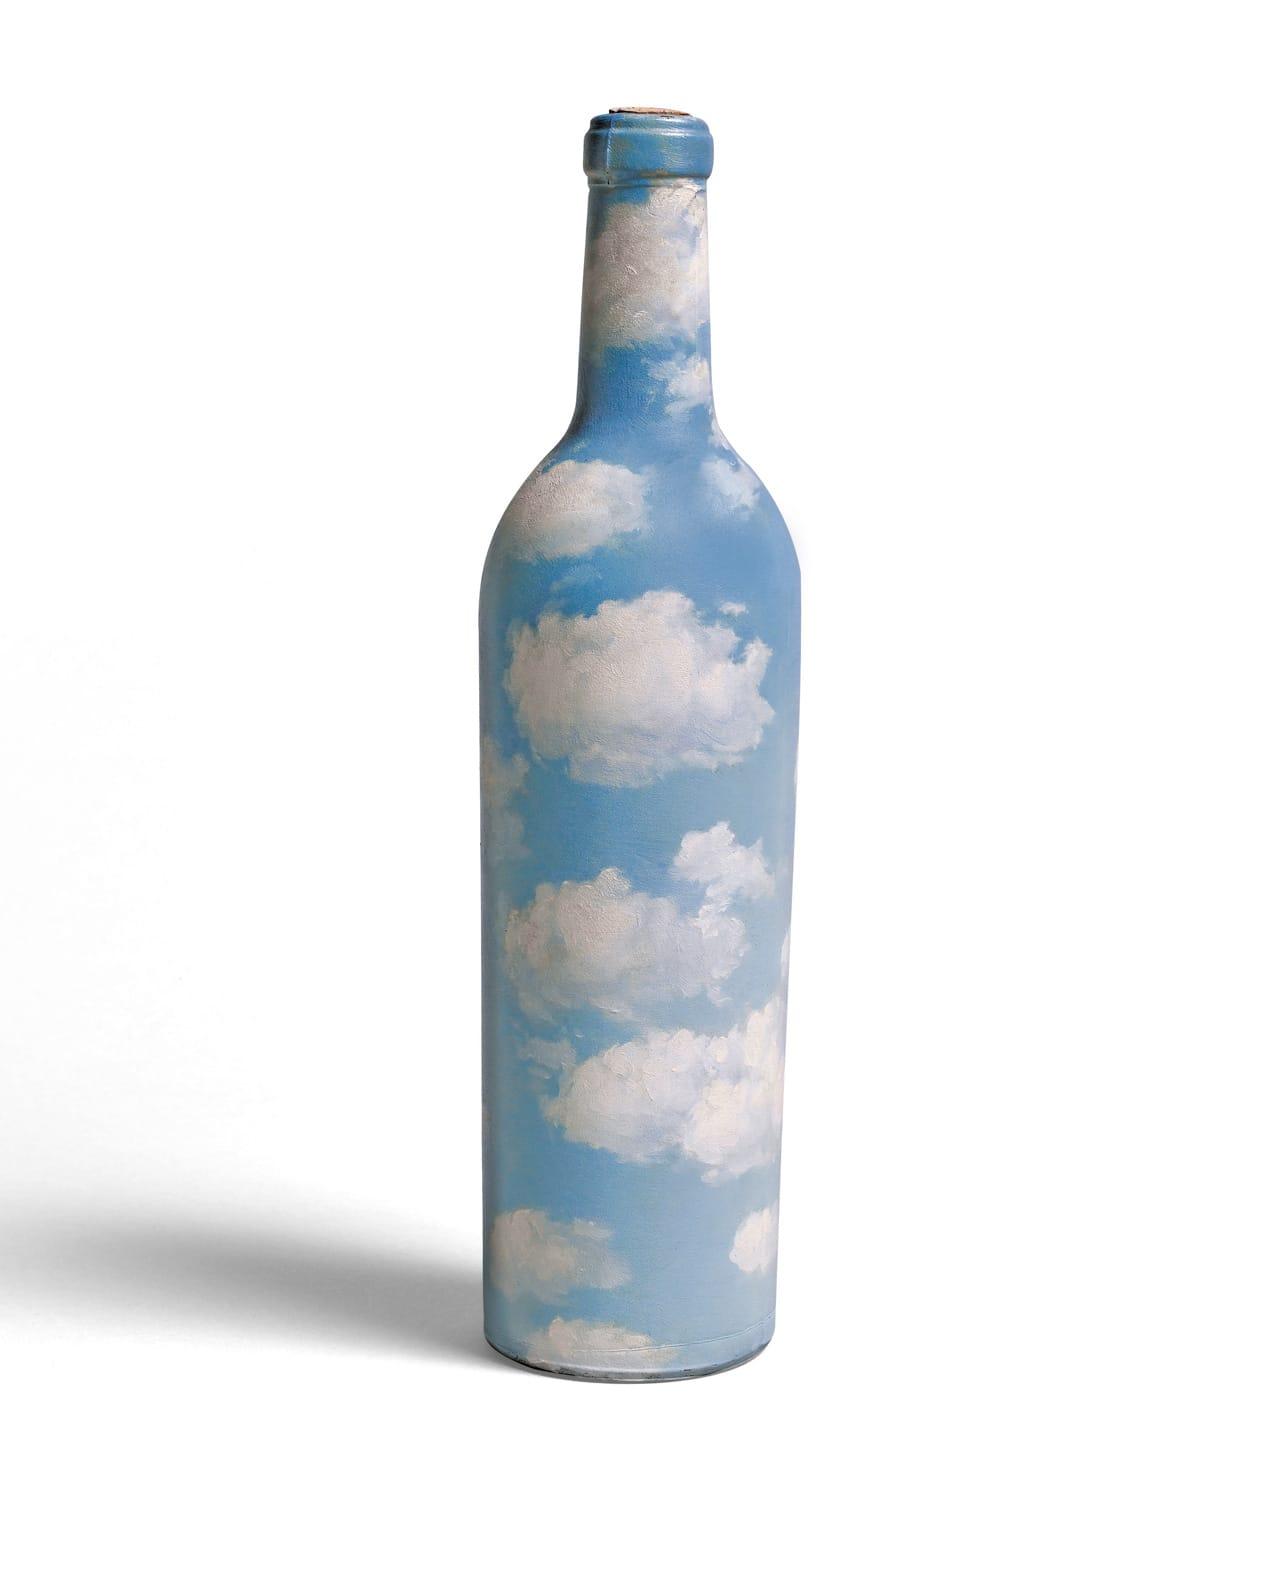 René Magritte, Ciel-bouteille, 1940, oil on glass bottle. Estimate £600,000-800,000. Image: © Sotheby's, London